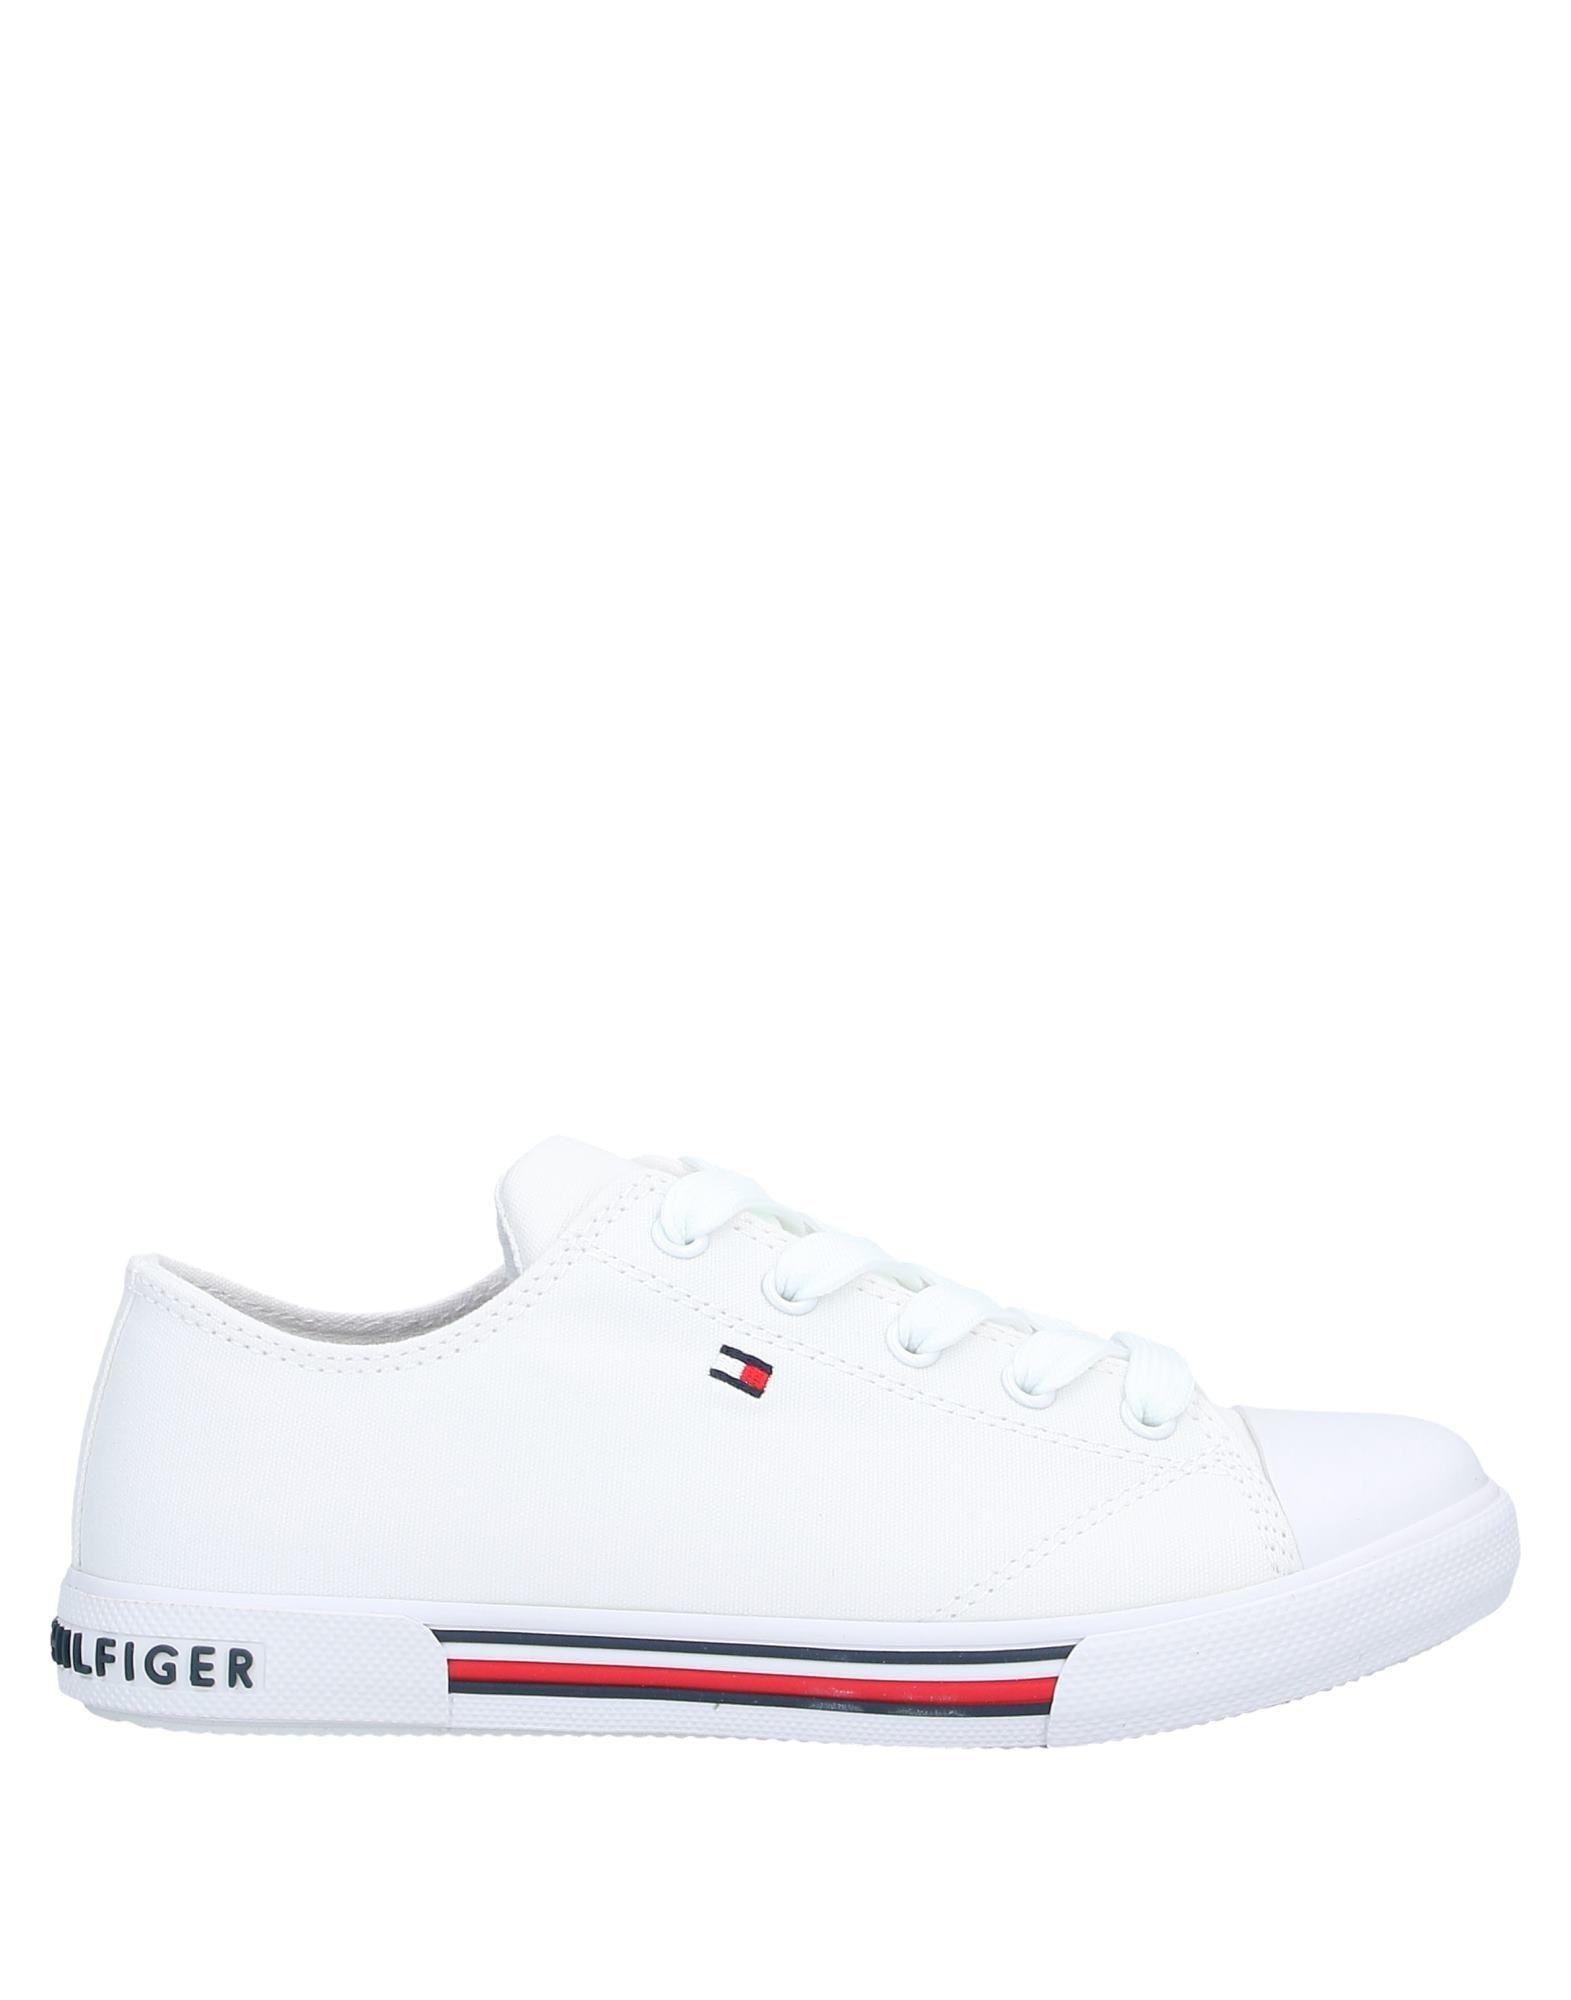 YOOX.COM(ユークス)《セール開催中》TOMMY HILFIGER Unisex スニーカー&テニスシューズ(ローカット) ホワイト 28 紡績繊維 / ゴム